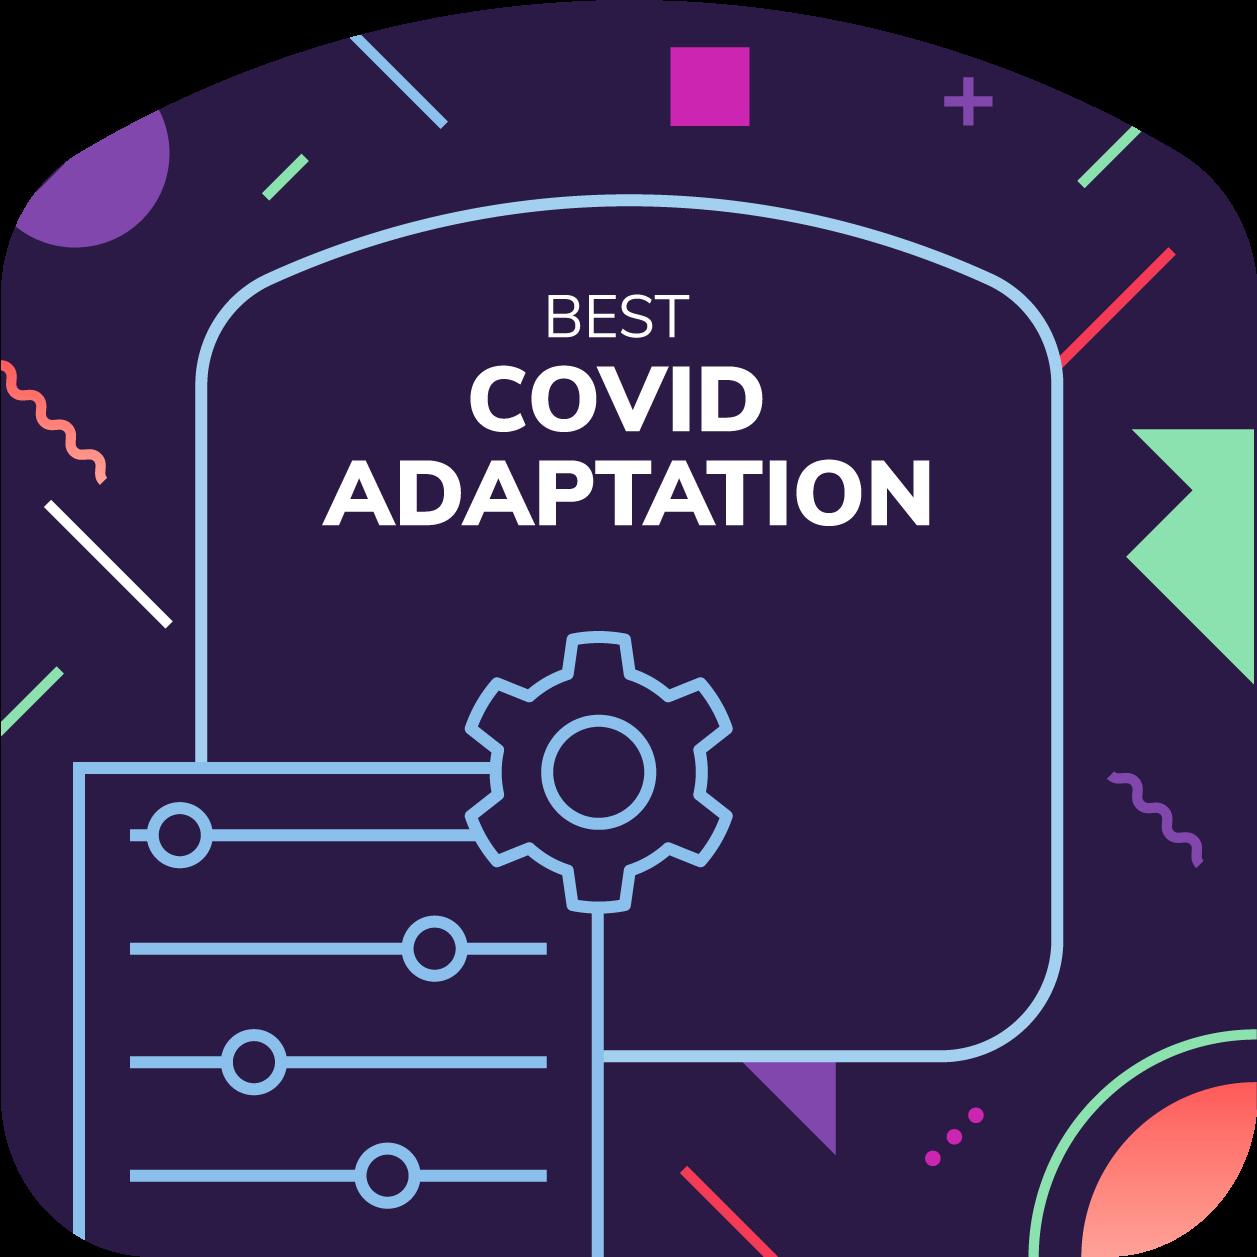 Best Covid Adaptation